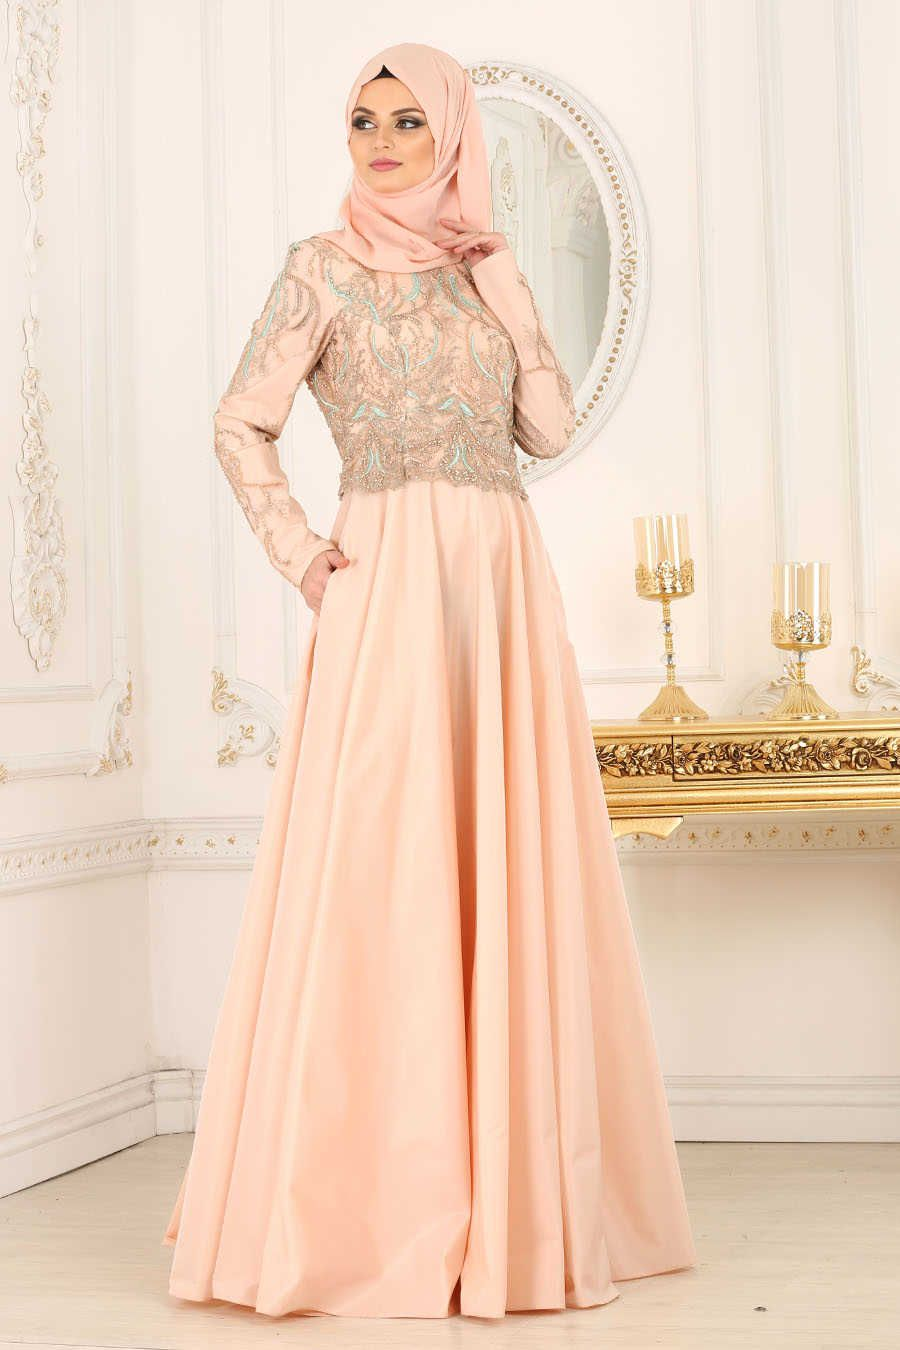 9ca8755d9fc24 Tesettür Giyim 2018 Mezuniyet Elbisesi Modelleri   Abiye & Elbise Modelleri    Dresses, Wedding dresses ve Fashion